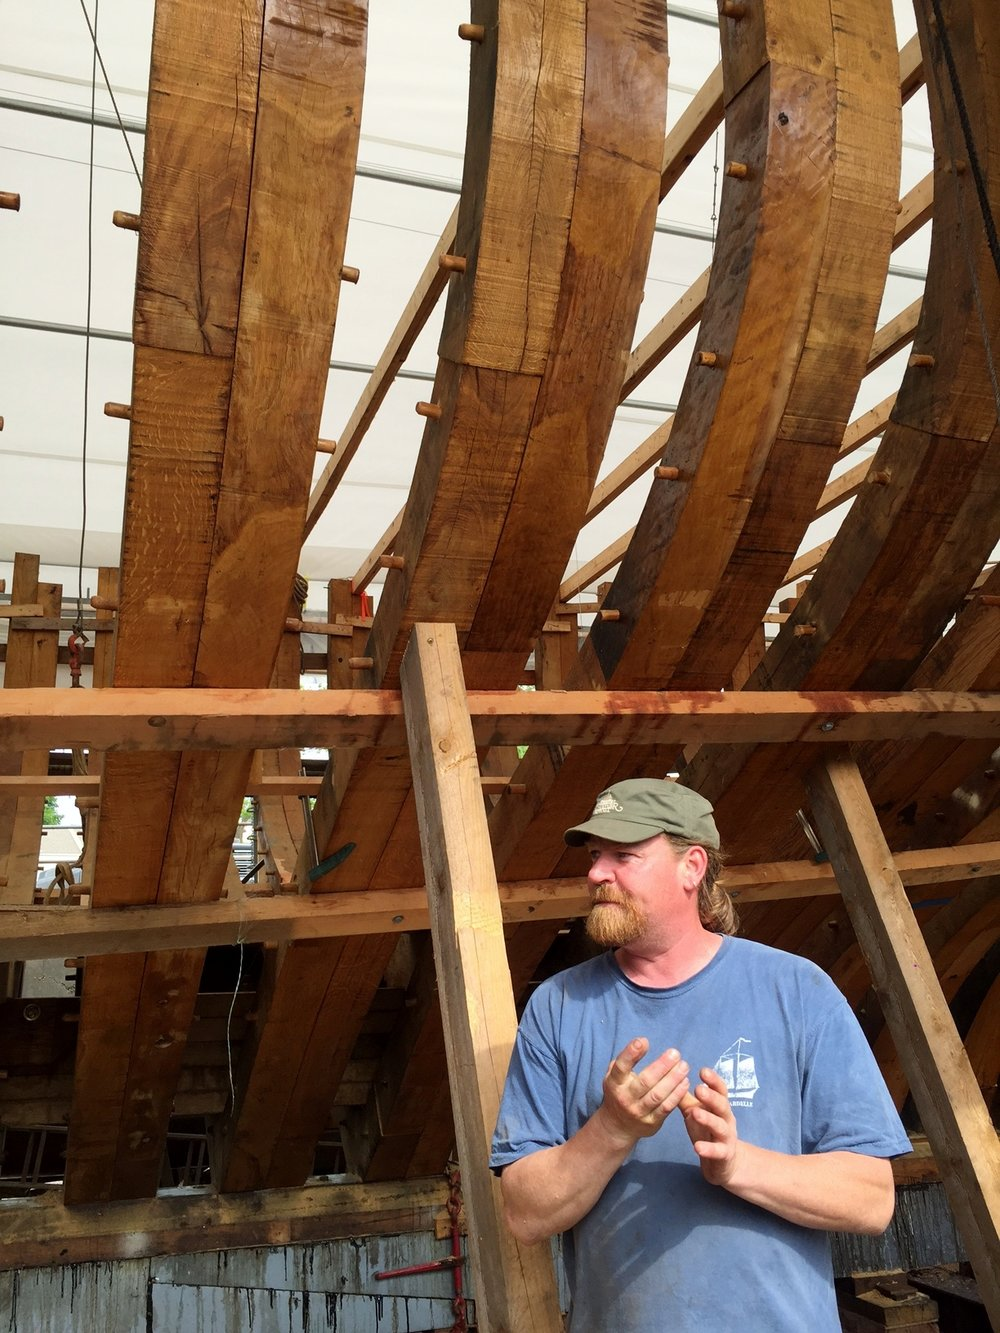 The Amazing Schooner Ernestina-Morrissey Restoration